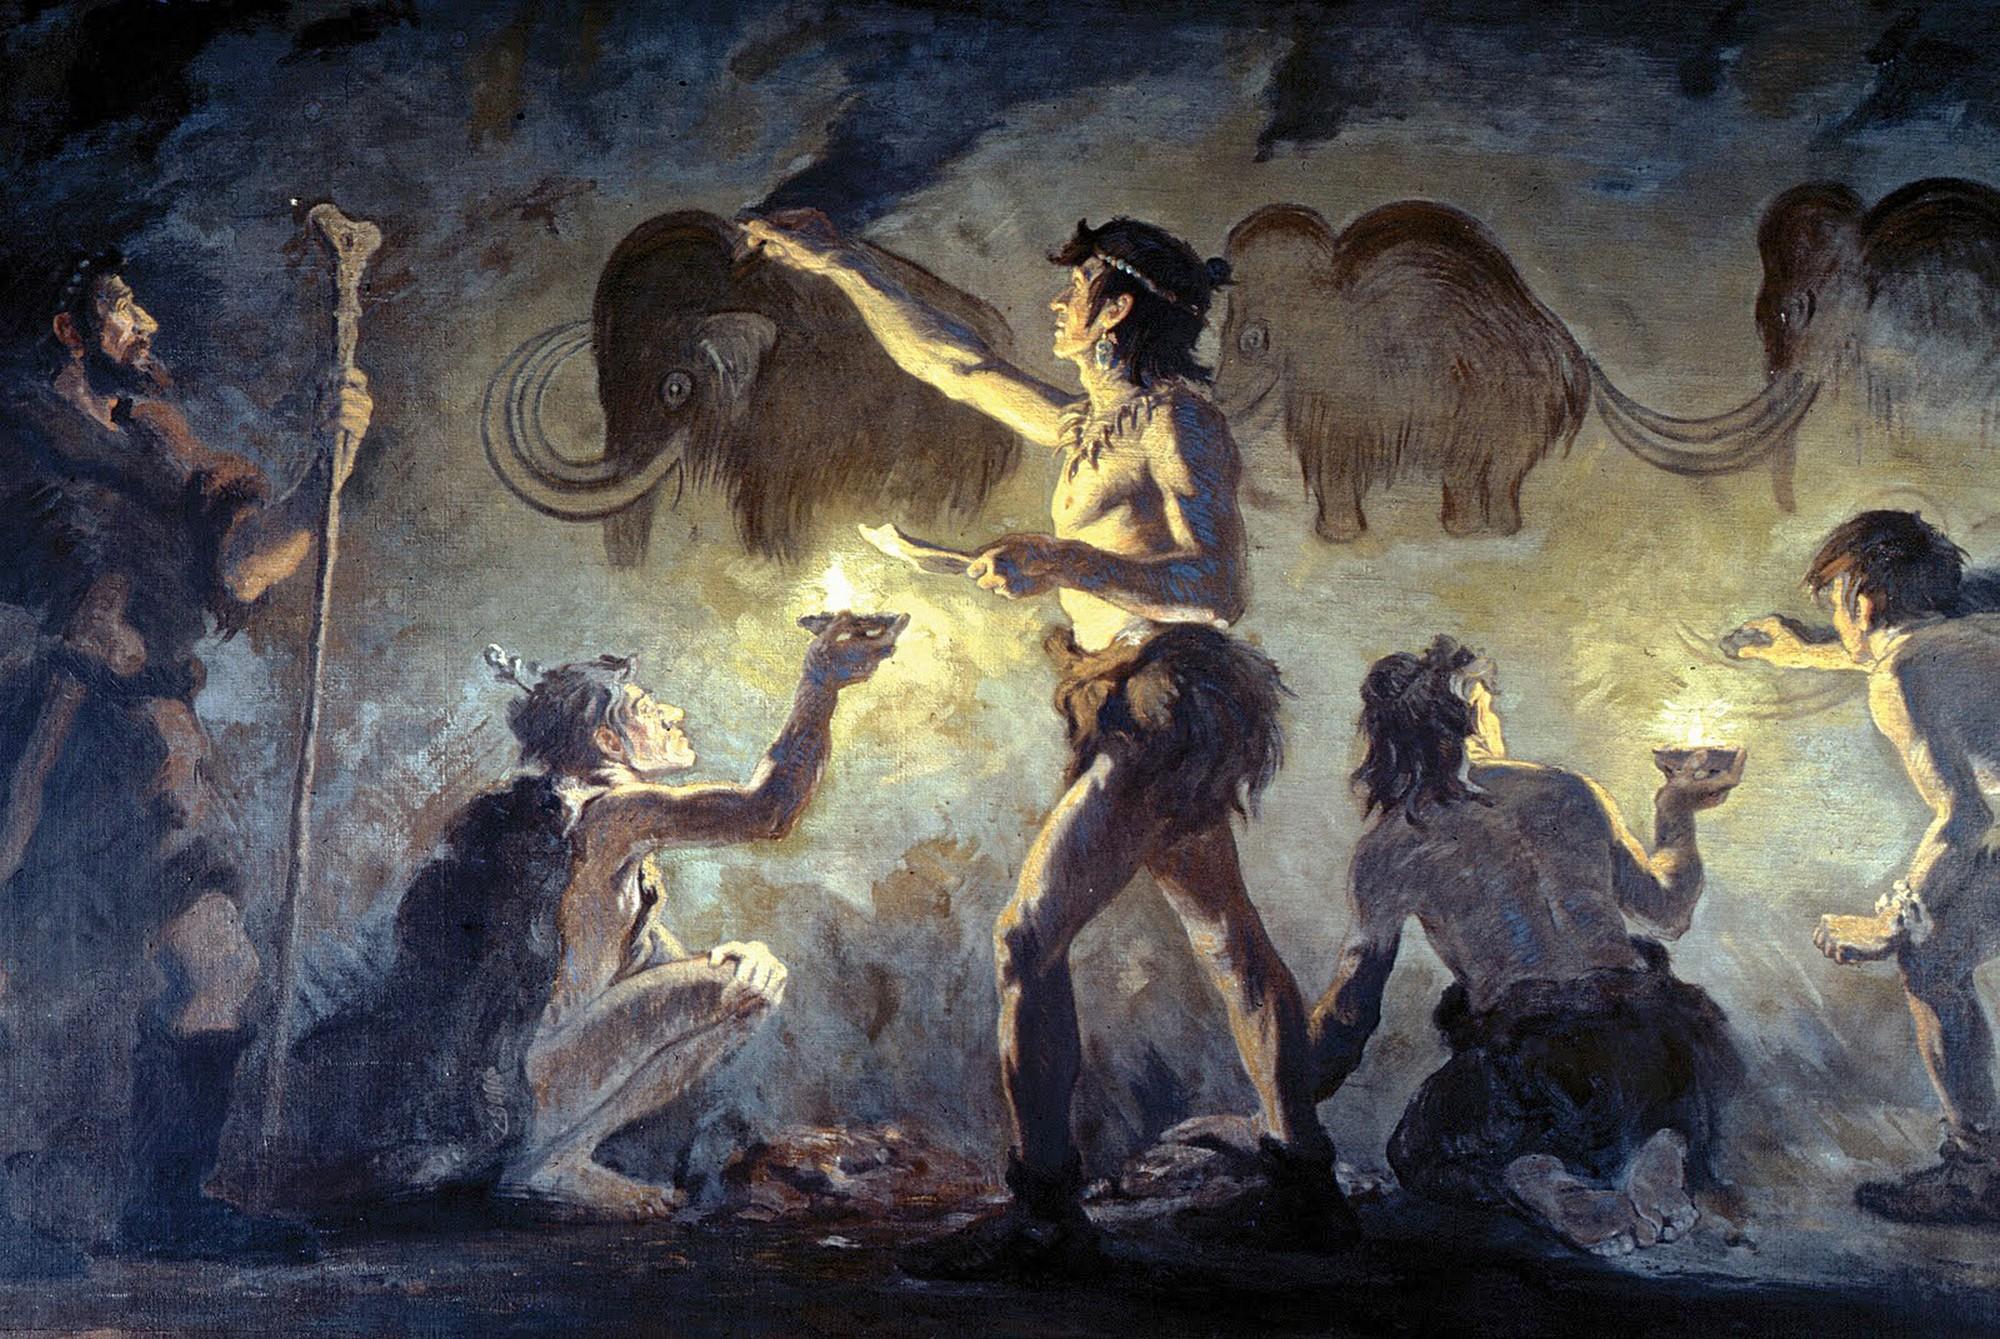 Роспись стен пещеры Фон-де-Гом, юго-западная Франция (Charles Robert Knight, American Museum of Natural History).